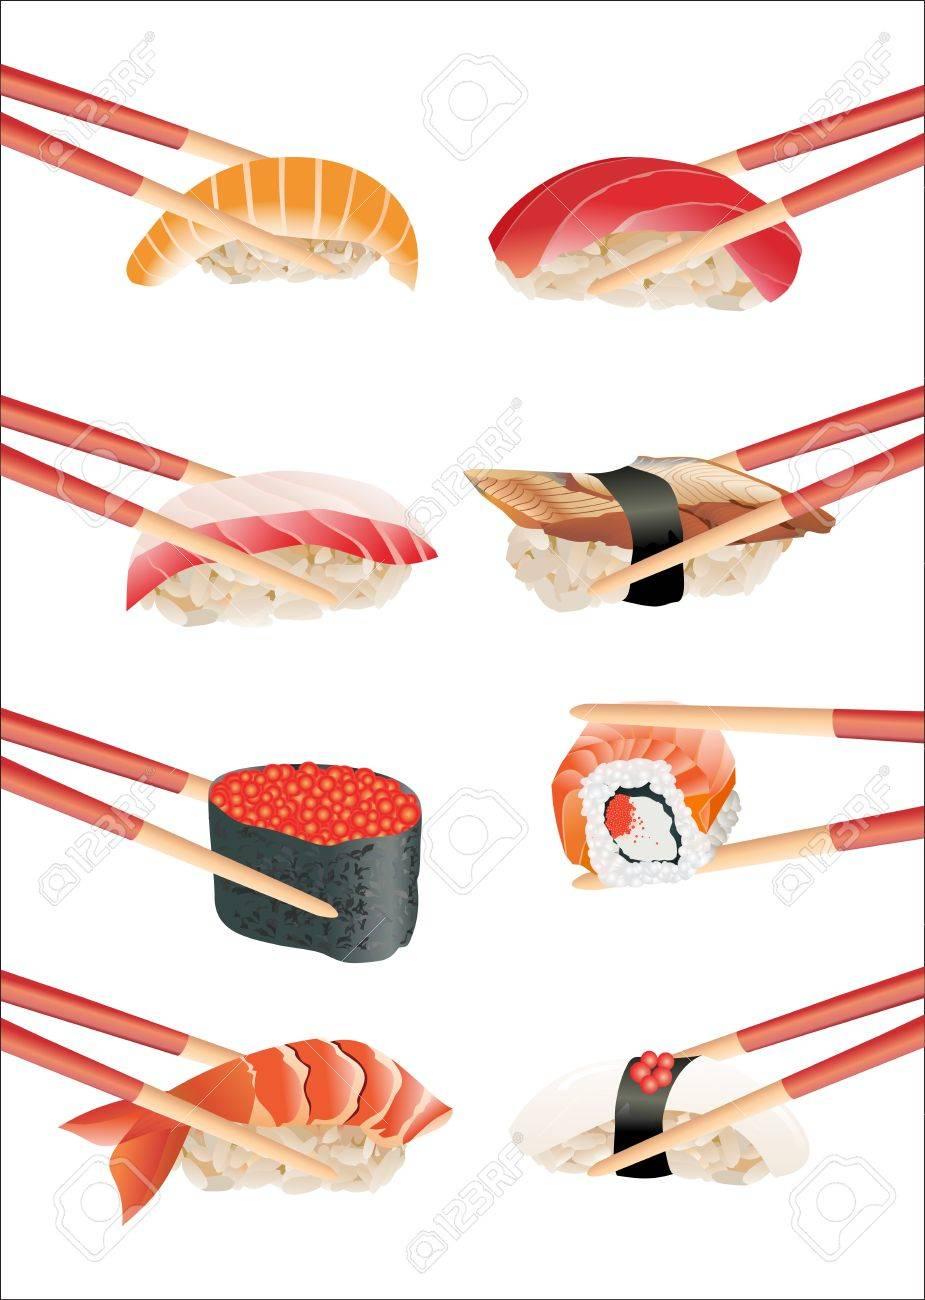 Sushi with chopsticks isolated over white background - 16749639